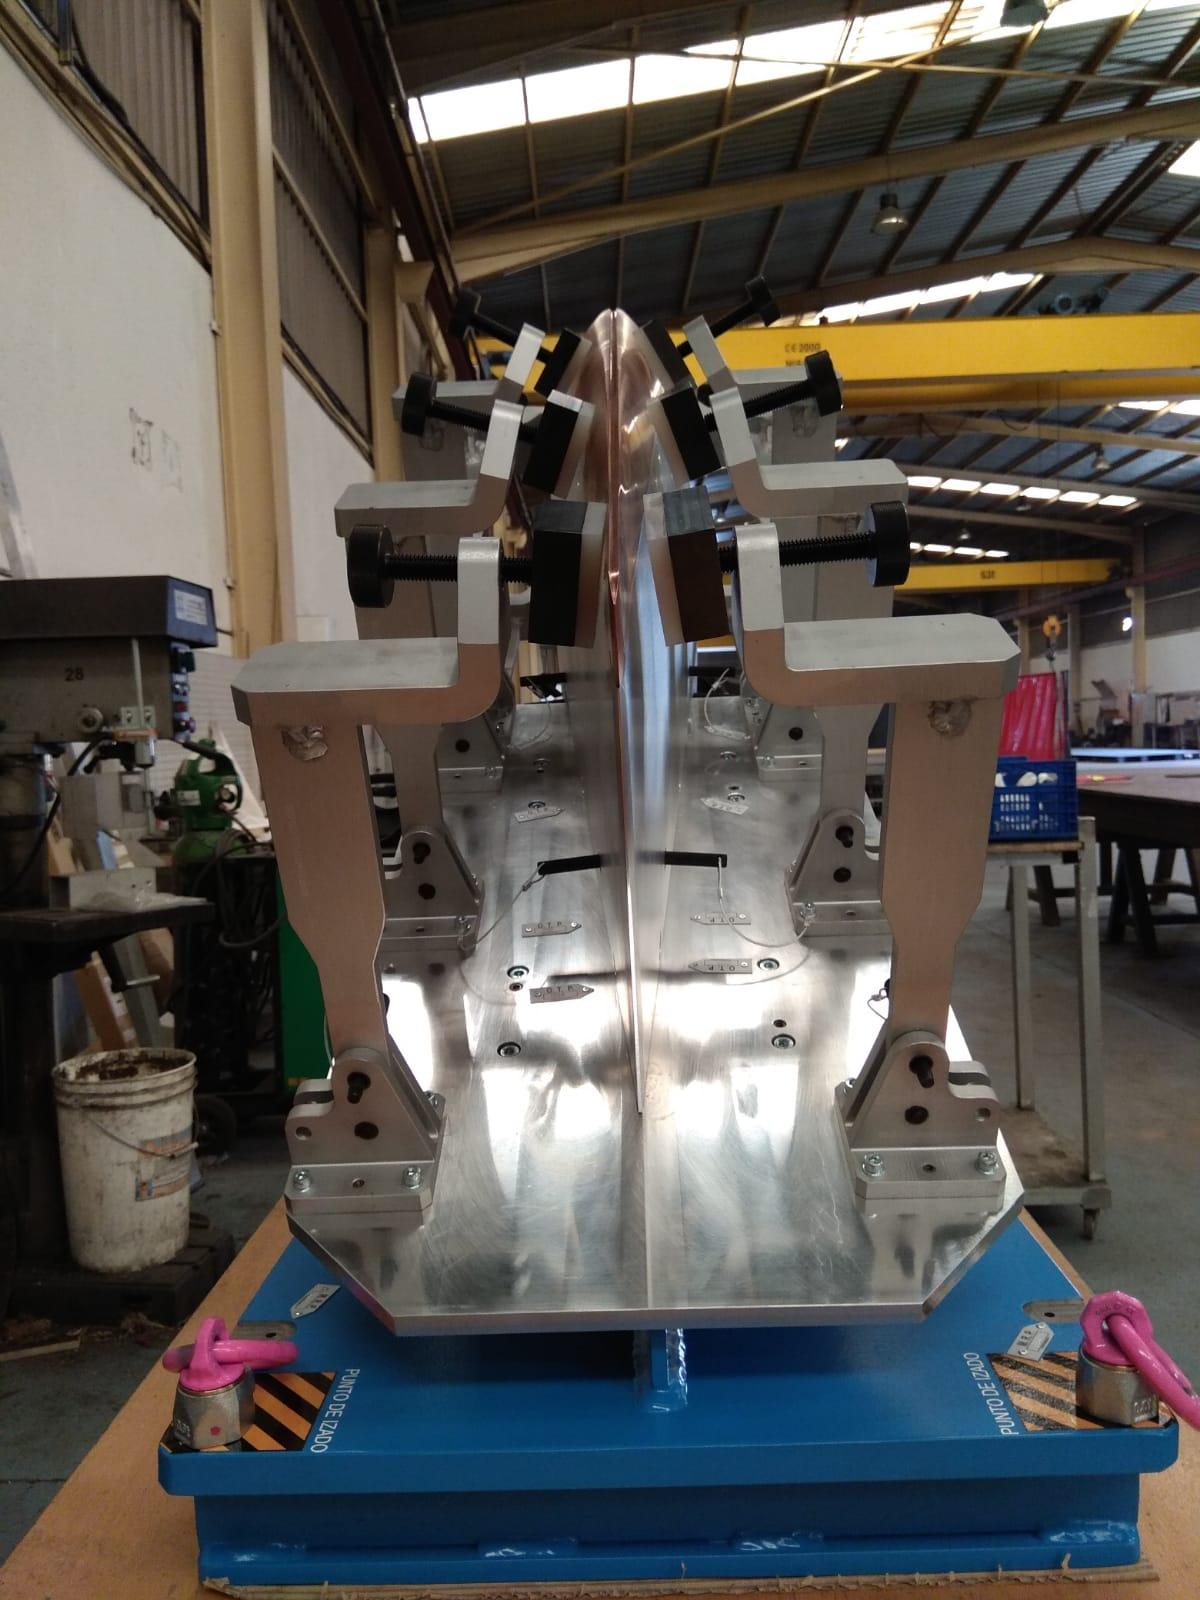 IMG 20181001 WA0021 1 - Mecanizado de Piezas